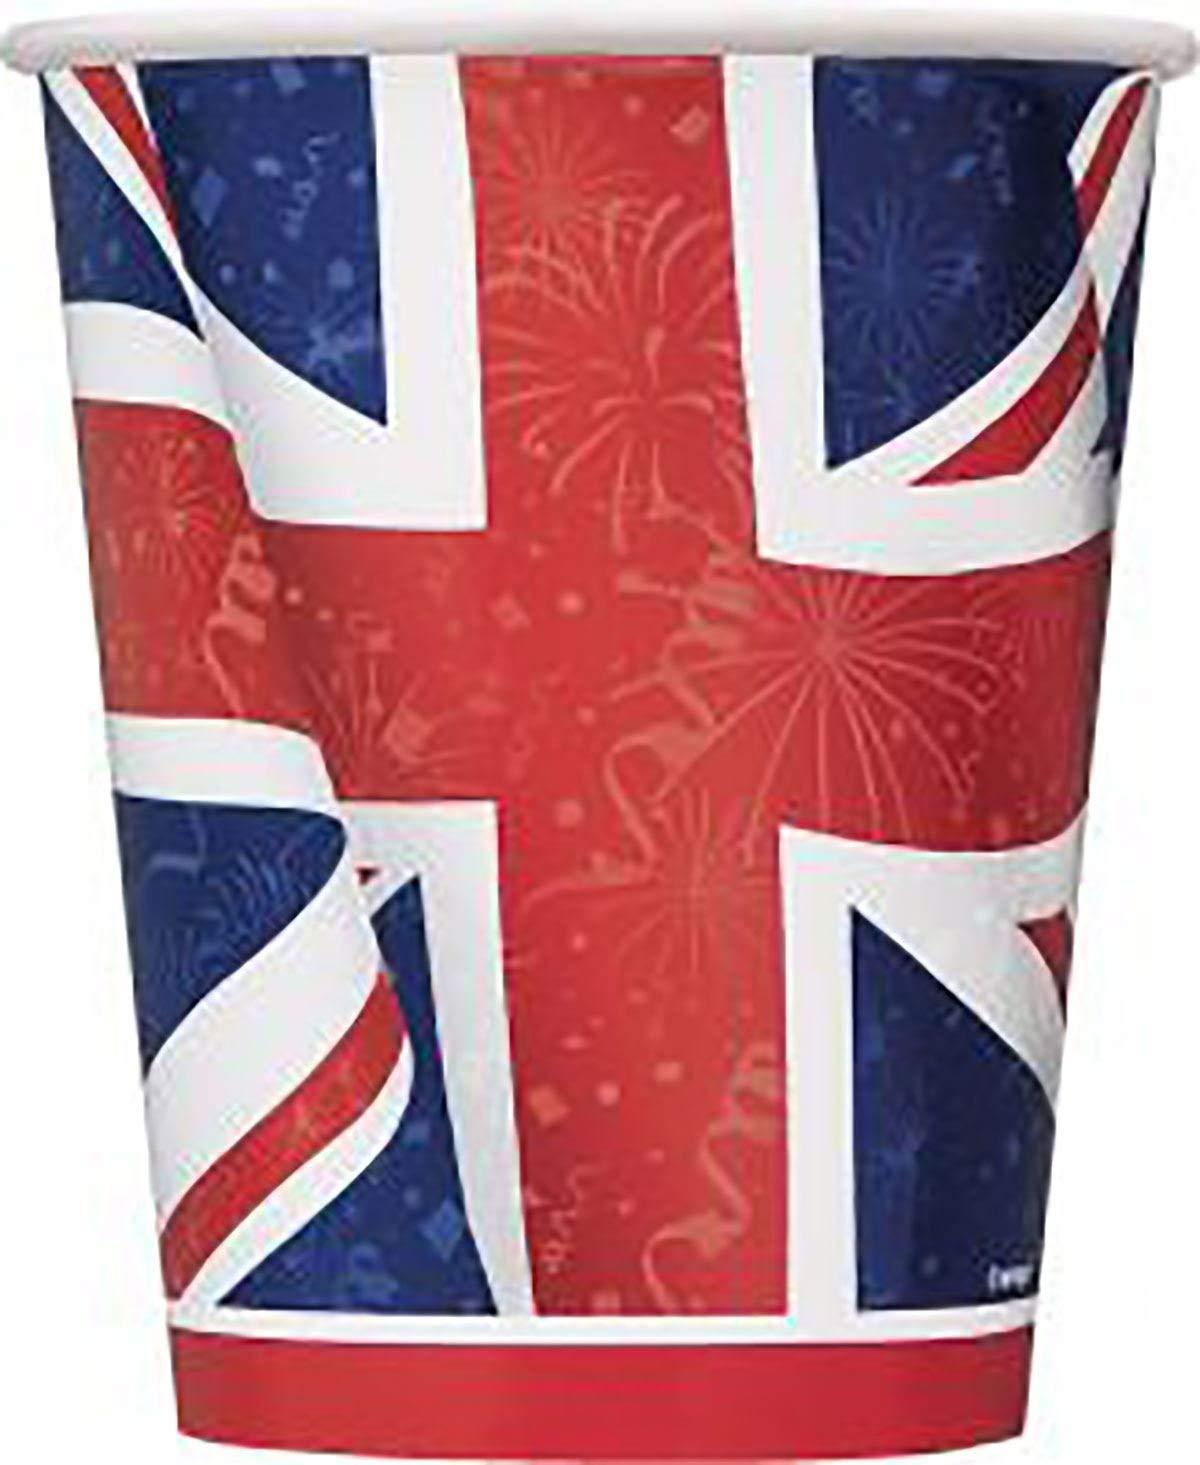 DIGITAL SPOT Britain Union Jack 9 Oz Cups Party Paper Cups British Fancy Royal Wedding Party